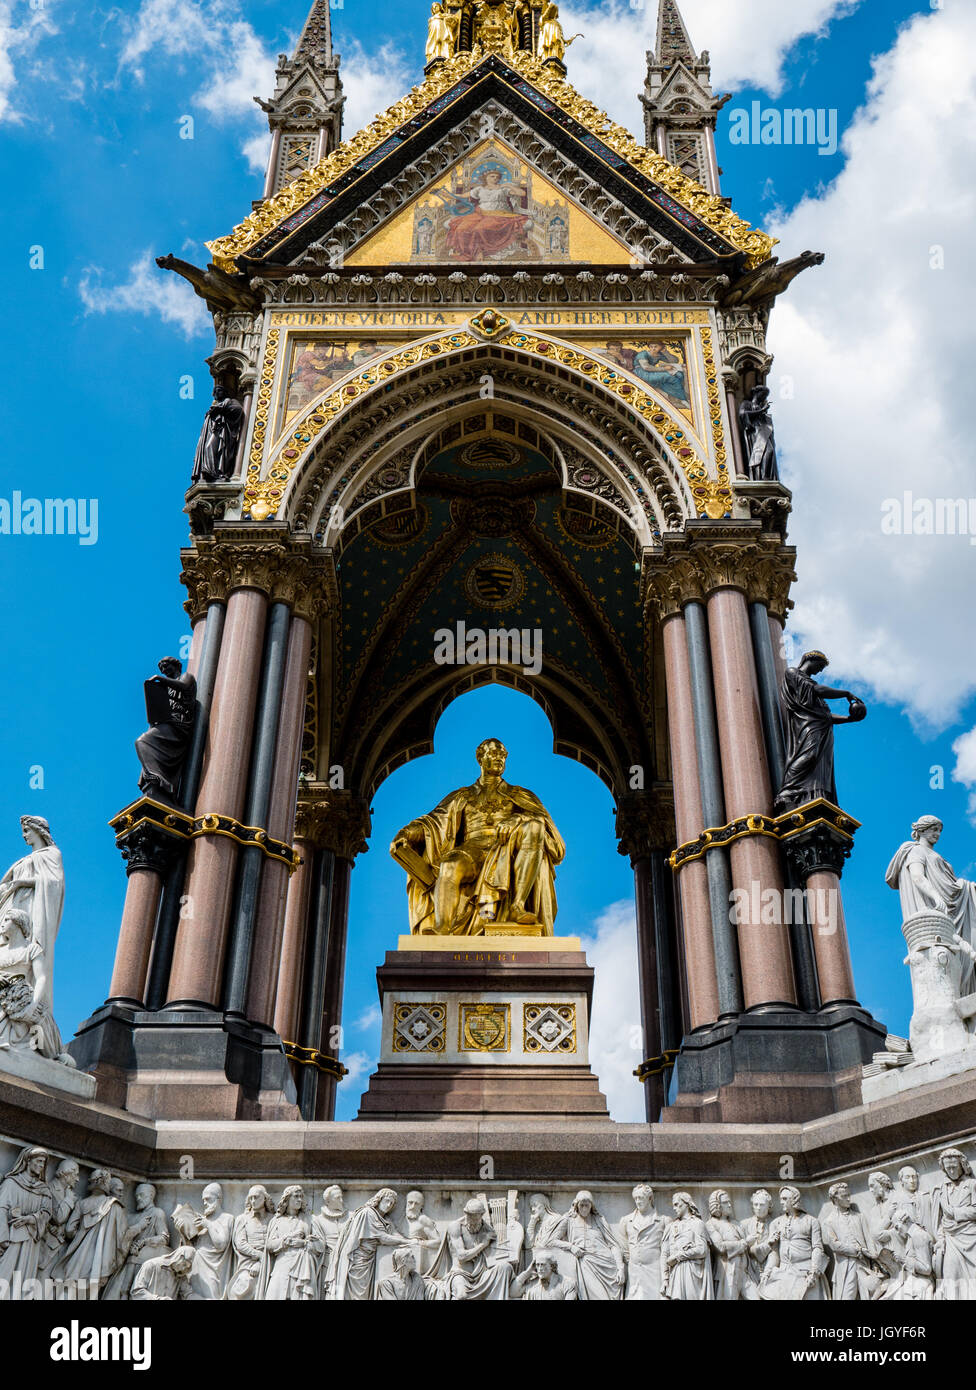 Das Albert Memorial, Kensington Gardens, London, England, UK, GB. Stockfoto